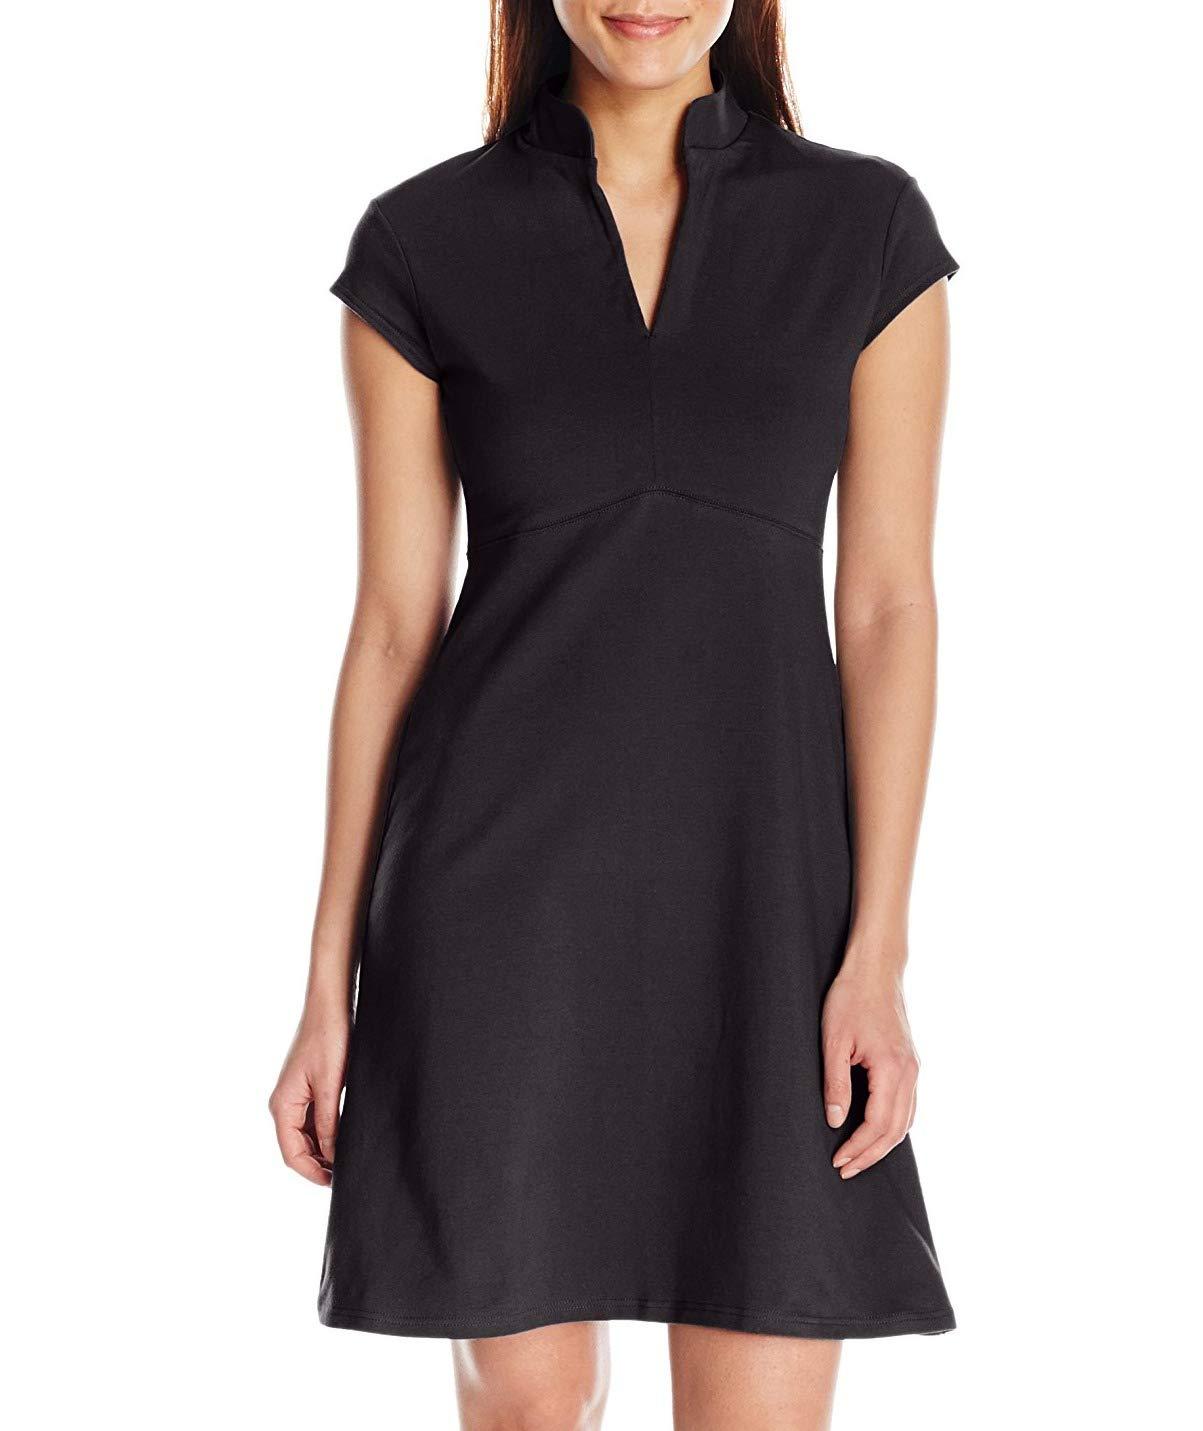 FIG Women's Bom Dress